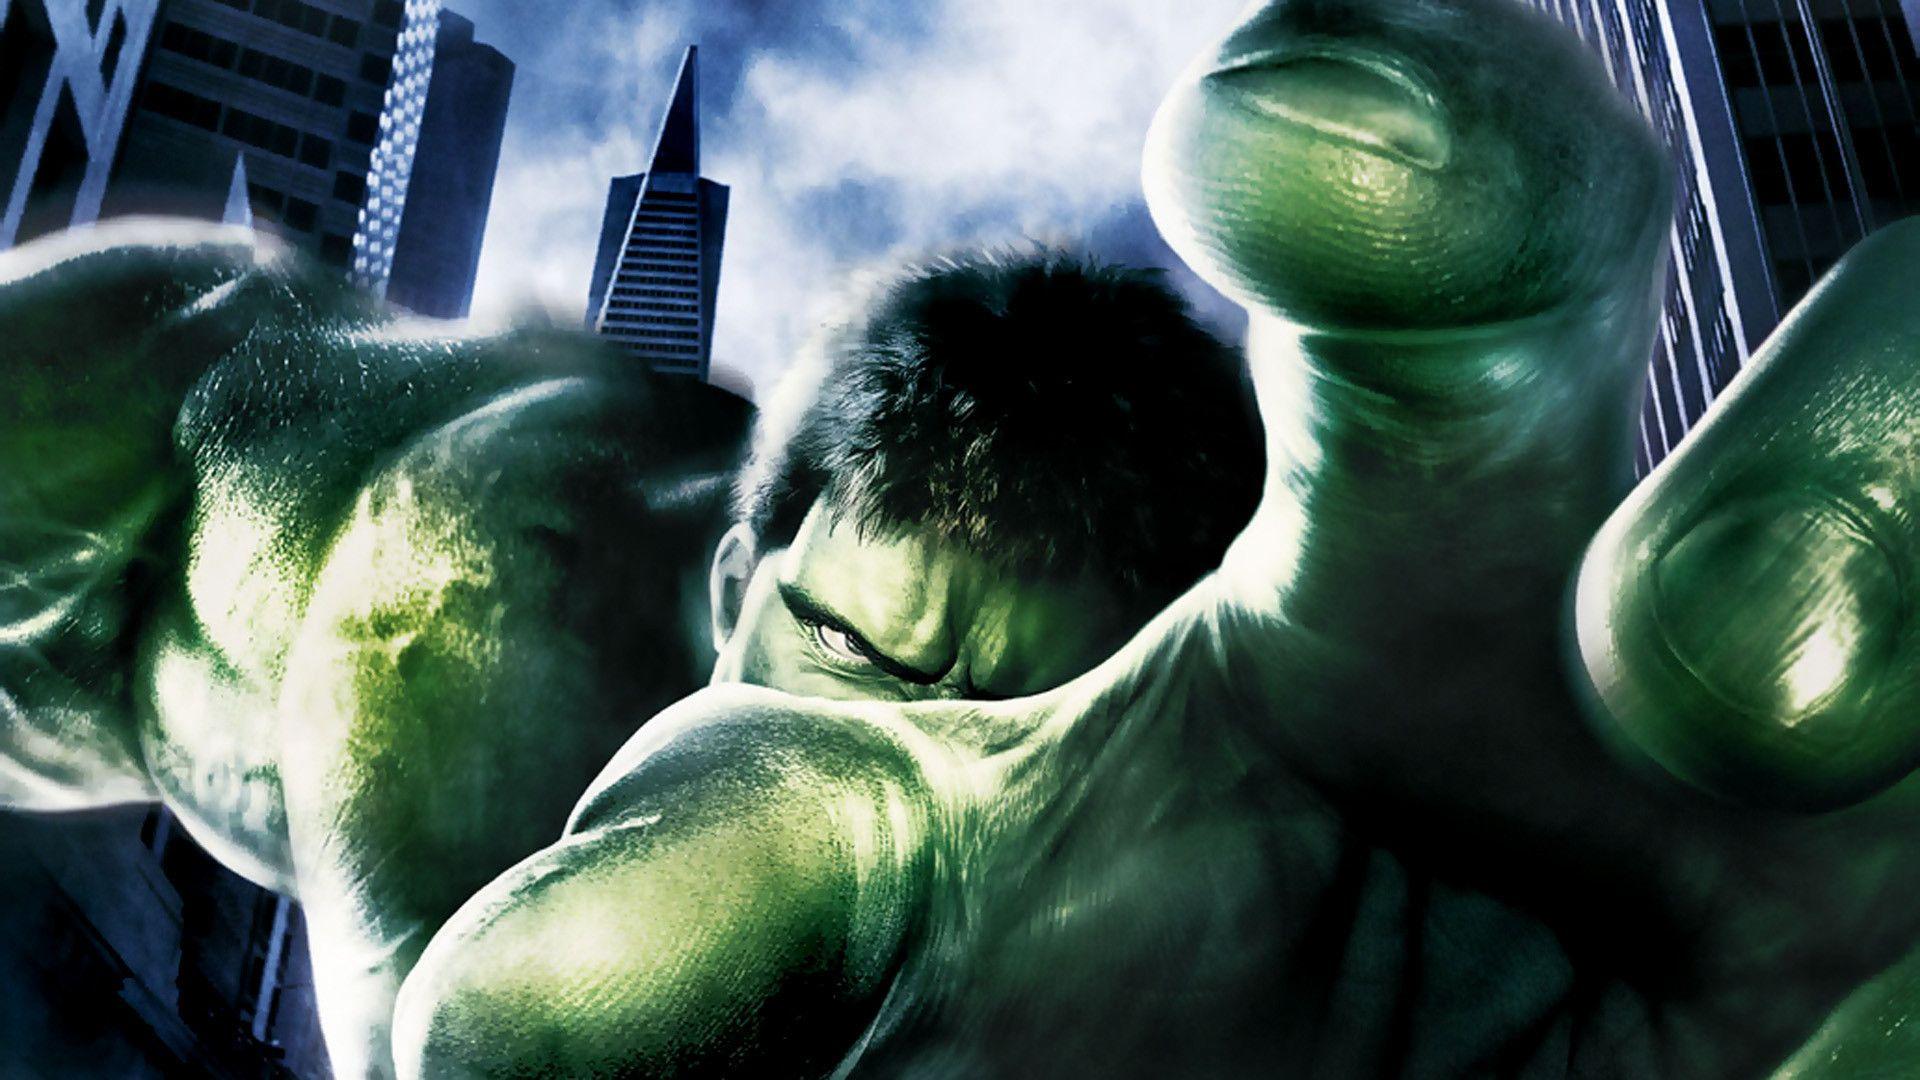 Dark Hulk Wallpaper Hd For Desktop Computer 4 In 2019